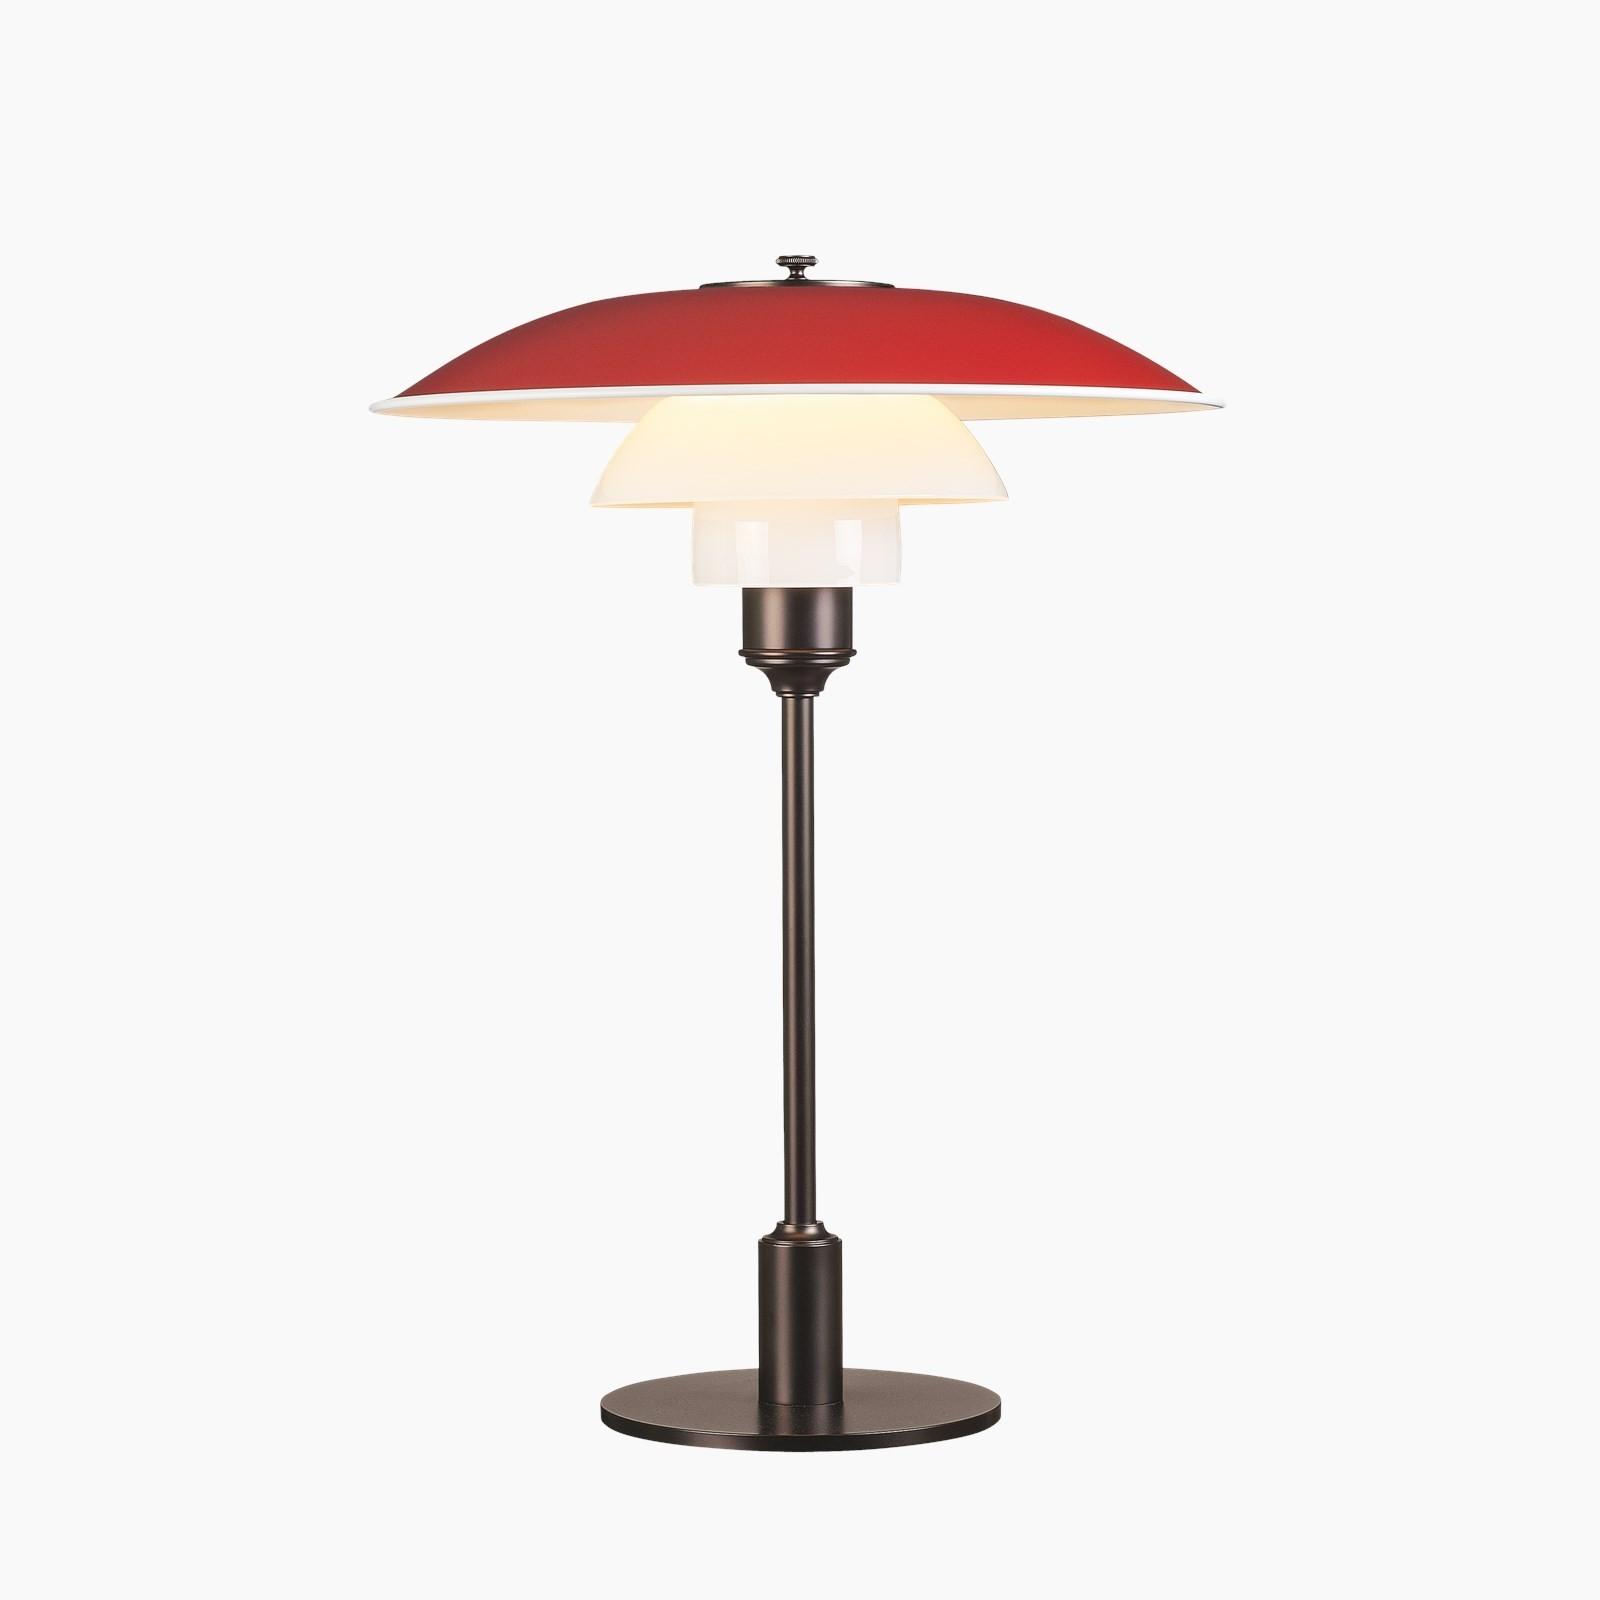 Louis Poulsen Ph 3 2 Table Lamp Buy Online At Deplain Com